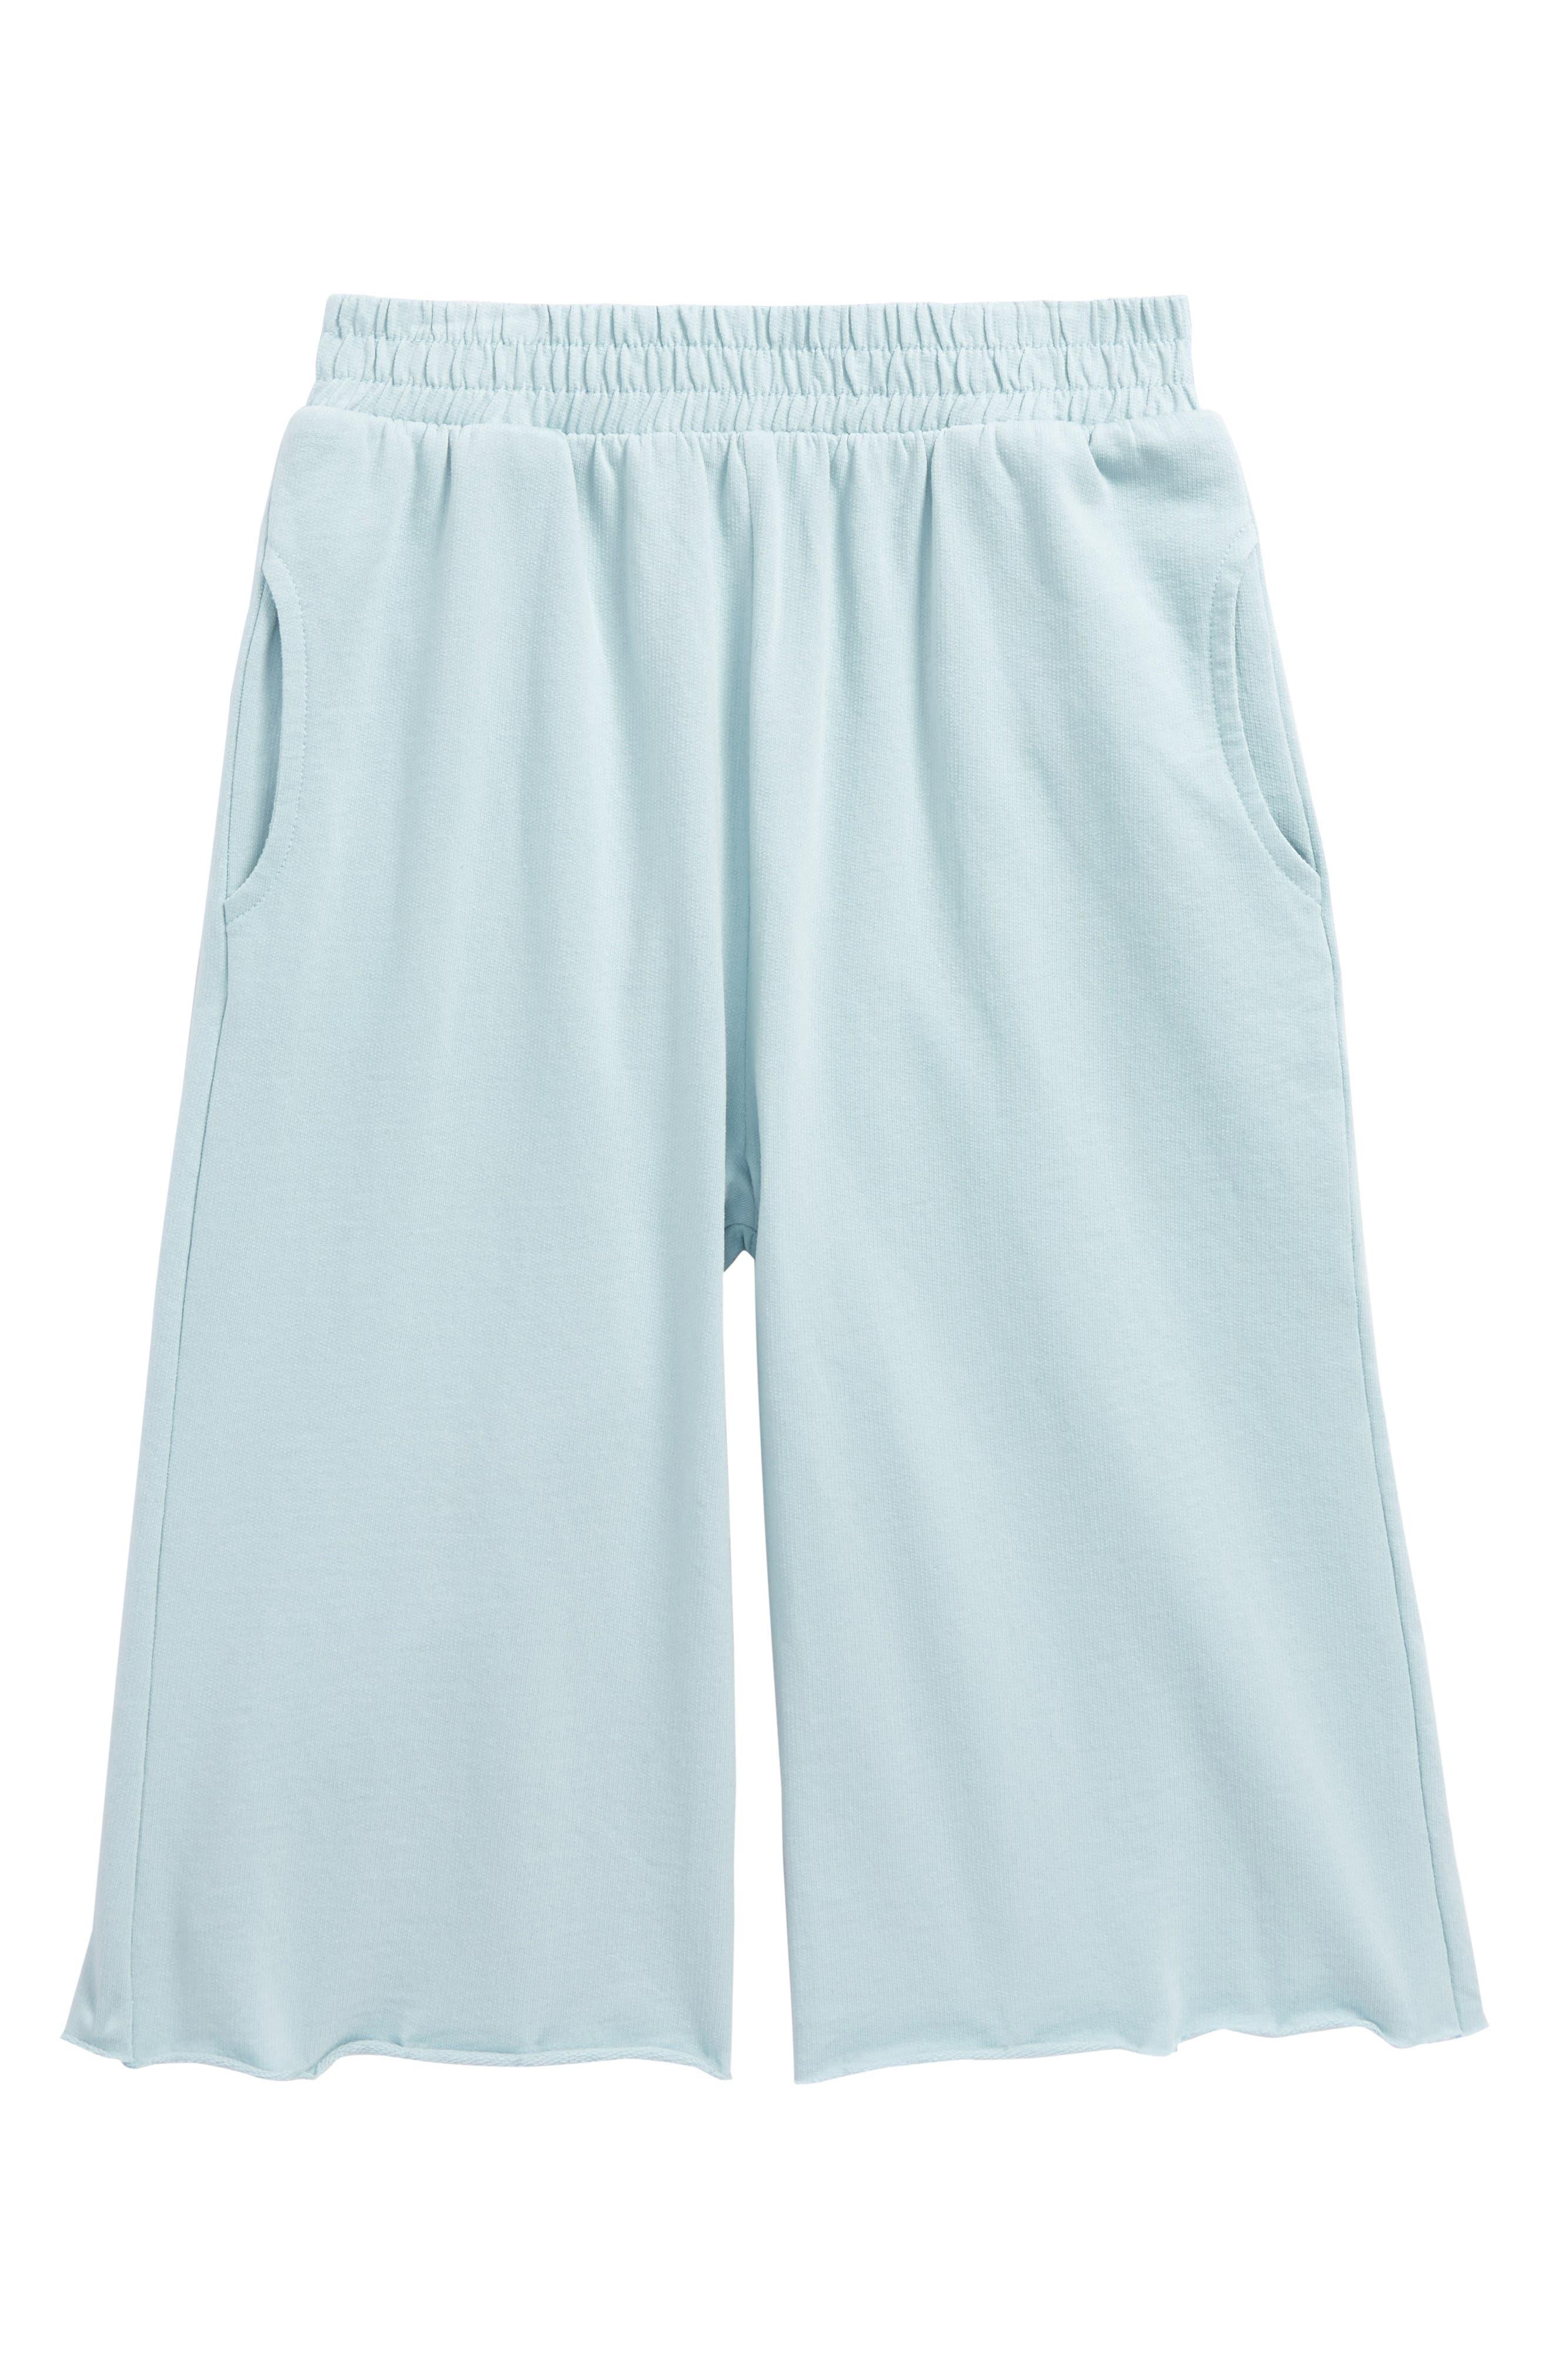 Wide Leg Sweatpants,                             Main thumbnail 1, color,                             450